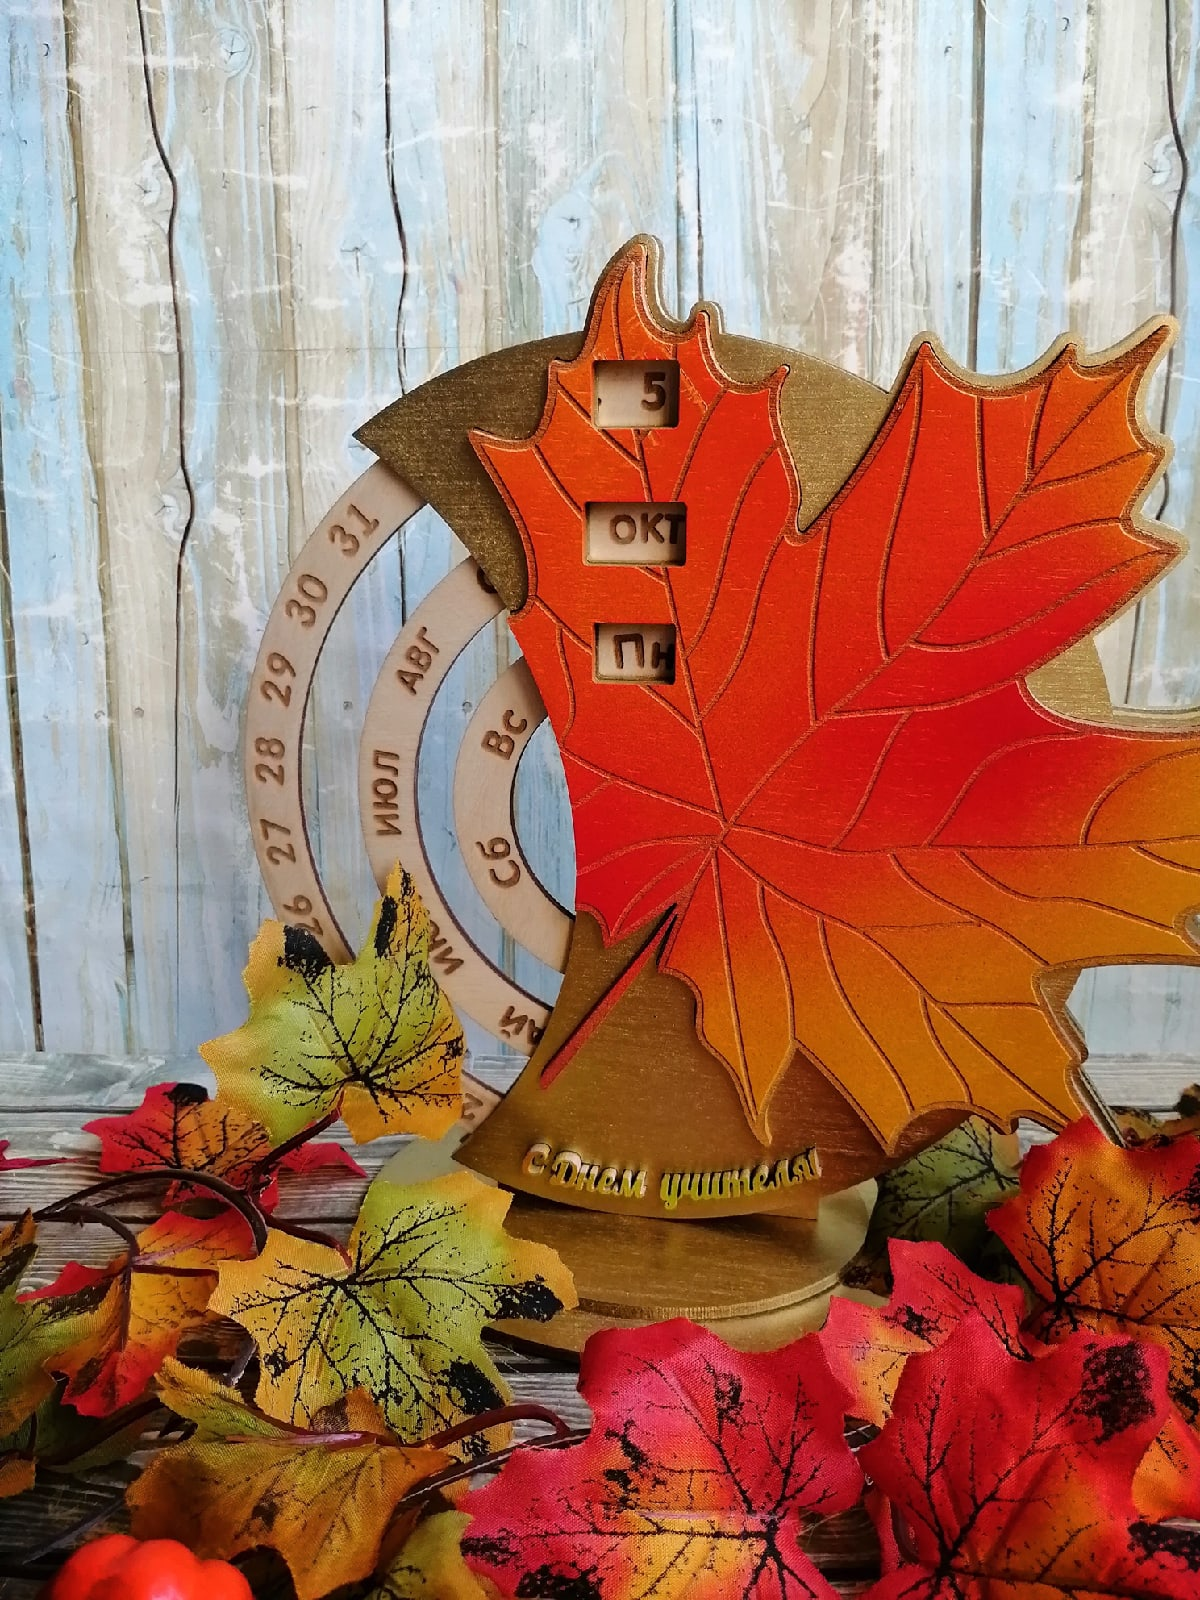 Laser Cut Autumn Floral Perpetual Calendar Free Vector